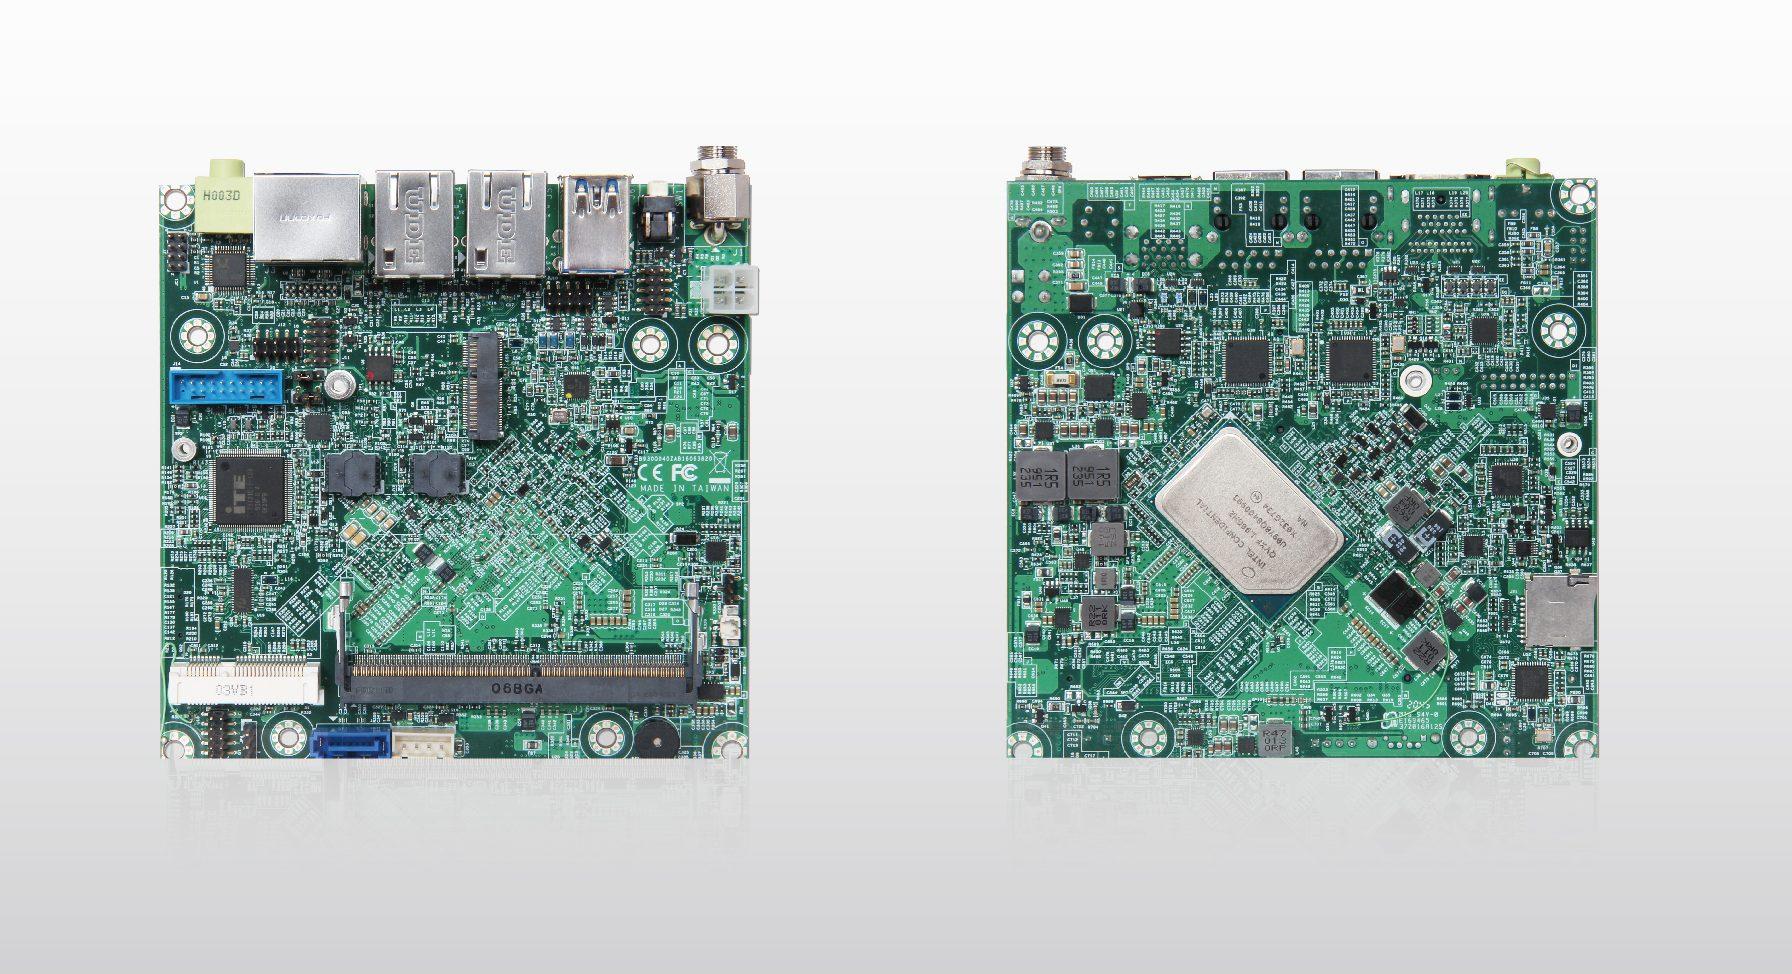 NANO-6063, the Latest NANO-ITX Embedded Board Powered by Intel Atom® x6000E Series Processors